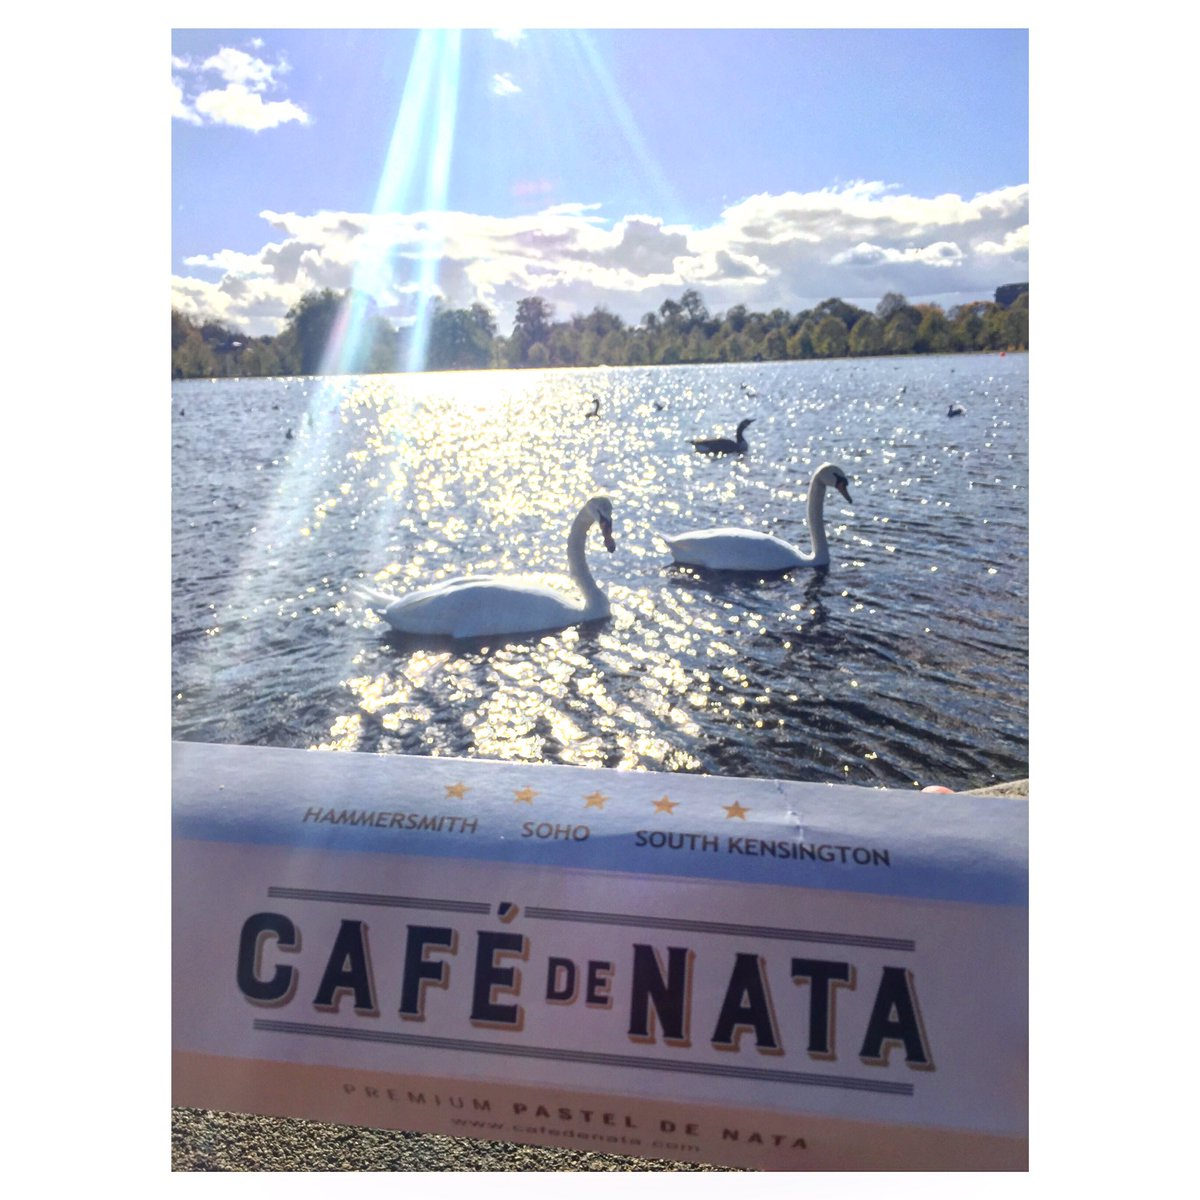 Spring is it you out there? 🦢 Wishing for more morning commutes like this one! 💕 #springinlondon #february #london #swans #sunnyinlondon #morning #hydepark #kensingtonpalace #kensingtongardens #cafedenata #commute #coffee #pasteldenata #pasteisdenata #monday #cafe #nomnom